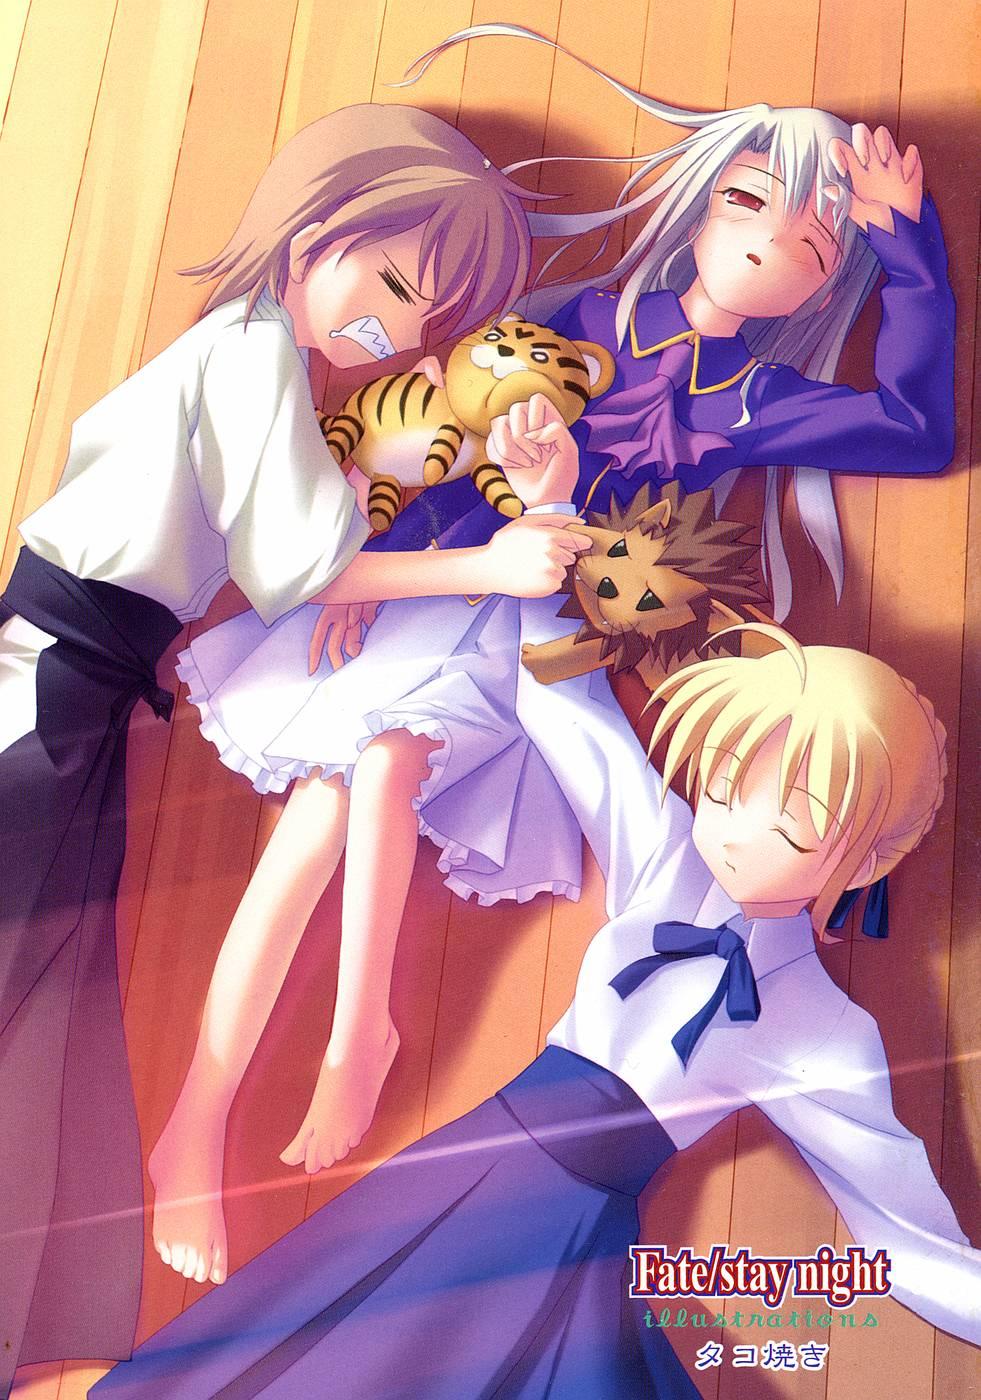 The Fate/Stay Night Image Thread! 1160%20-%20fate_stay_night%20feet%20fujimura_taiga%20illya_von_einzbern%20saber